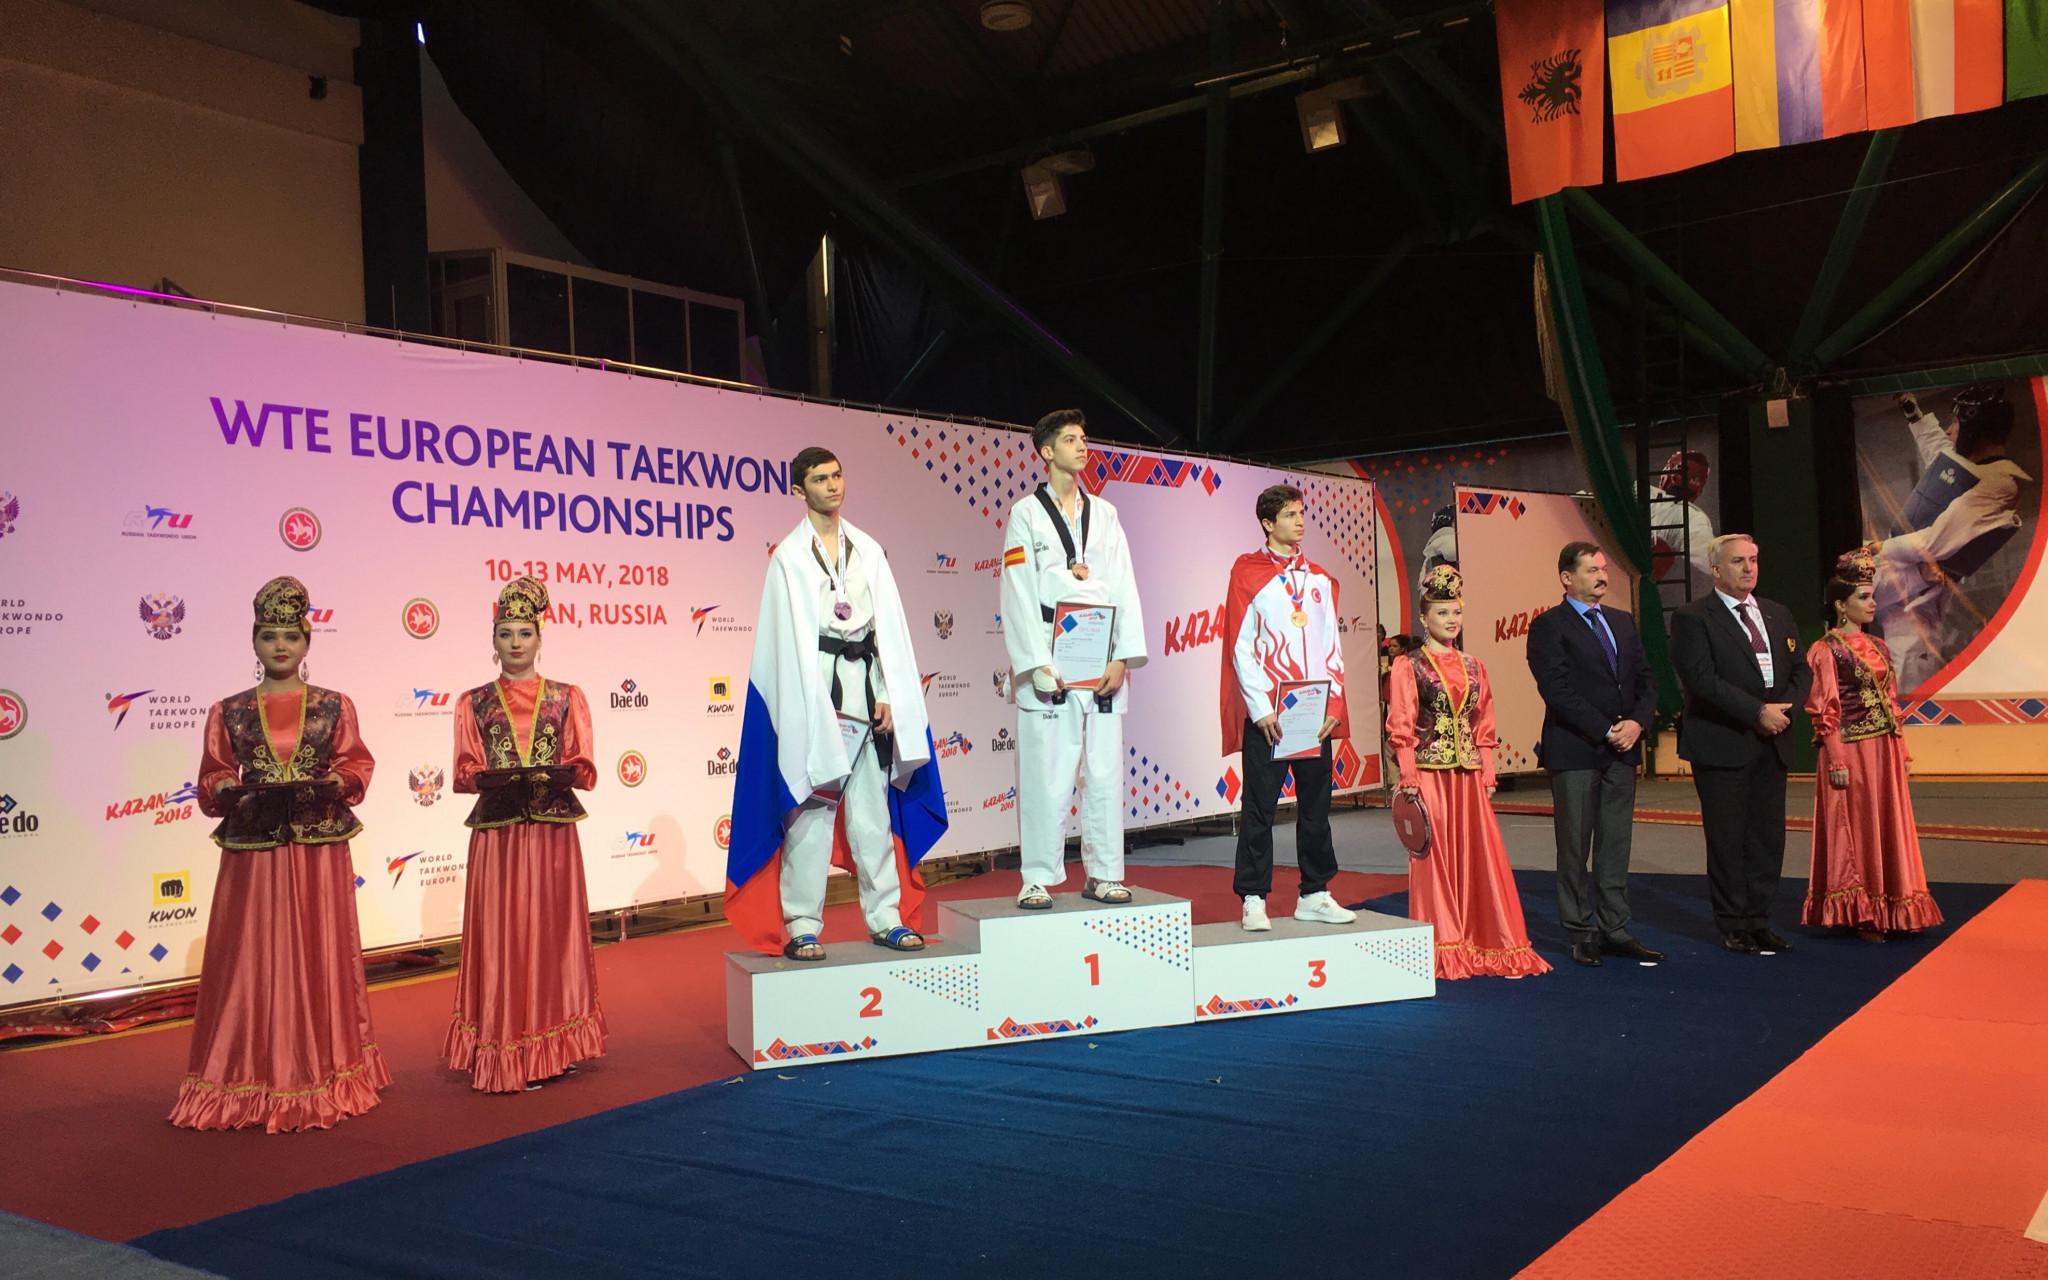 Spain's Adrian Vicente topped the men's under-54kg podium ©World Taekwondo Europe/Murat Tarhan